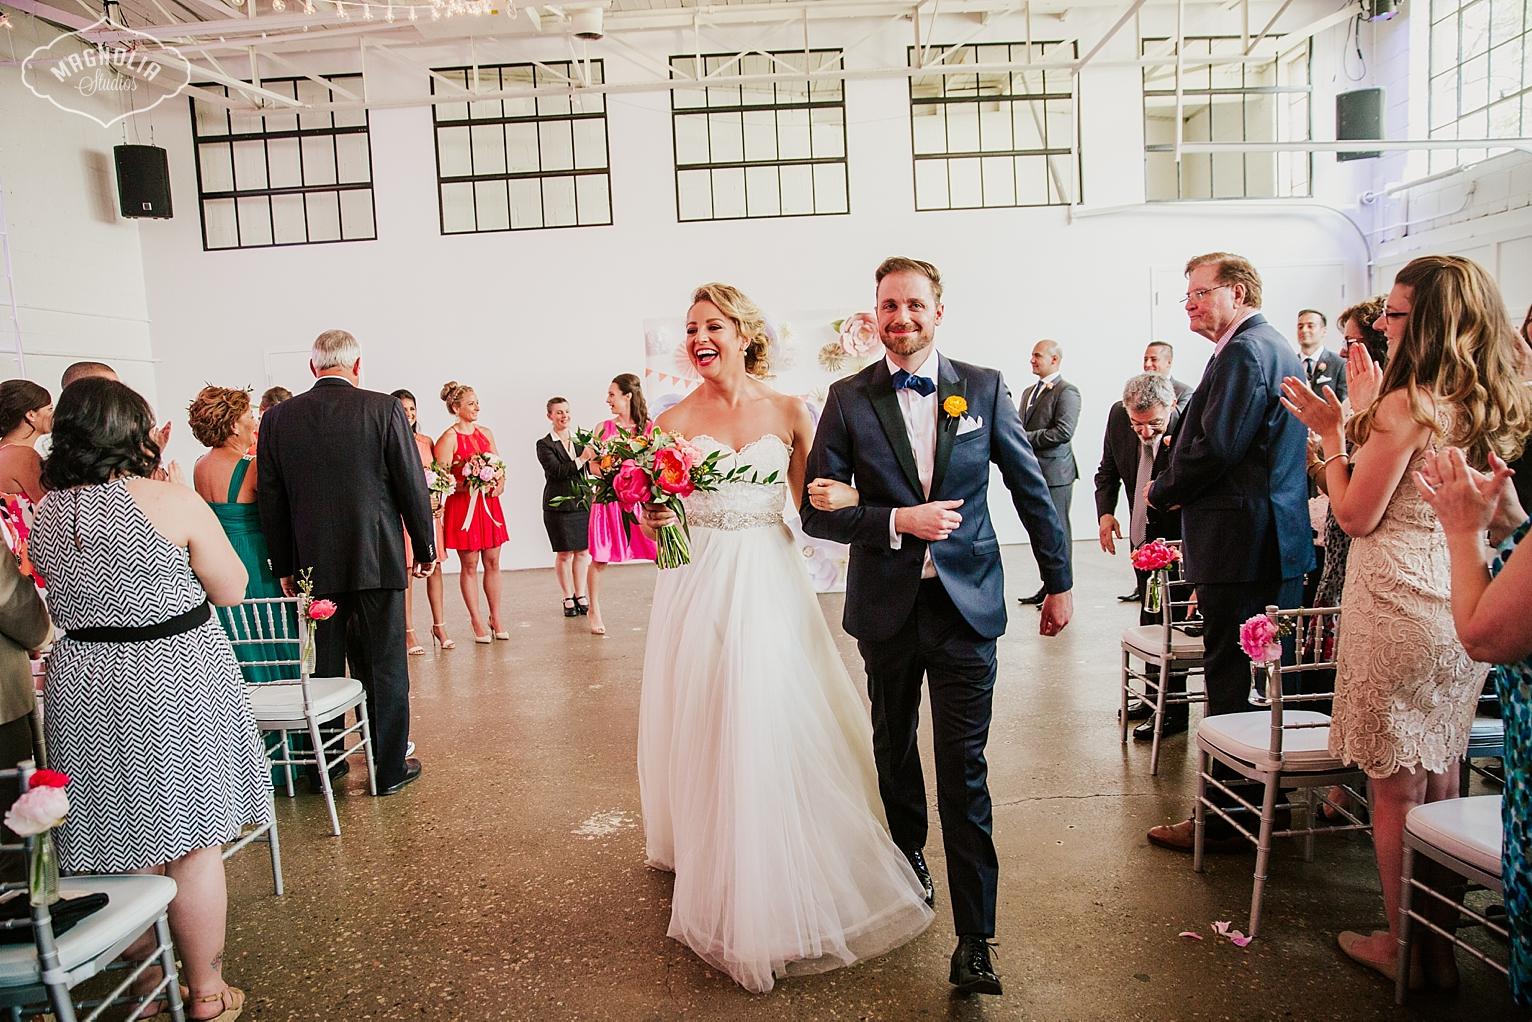 Airship 37 wedding